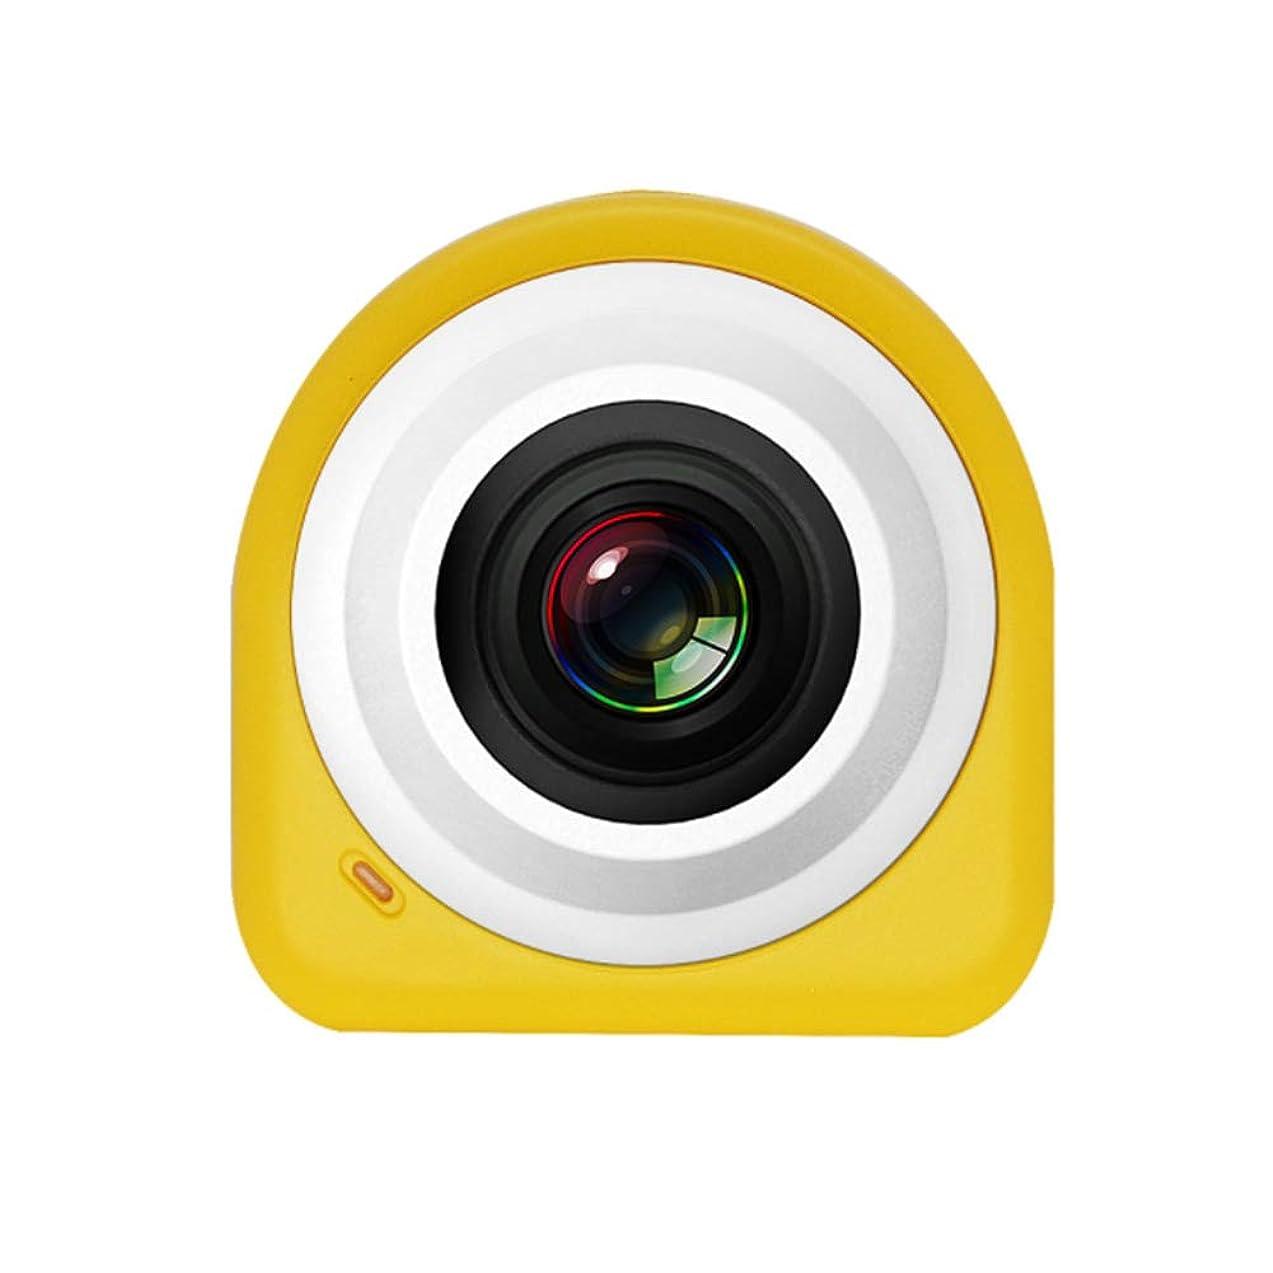 KEMANDUO Camera - Mini Sports Camera - Indoor Security Surveillance System 1080P HD Night Vision, Wireless Remote Monitoring Selfie Camera,Yellow